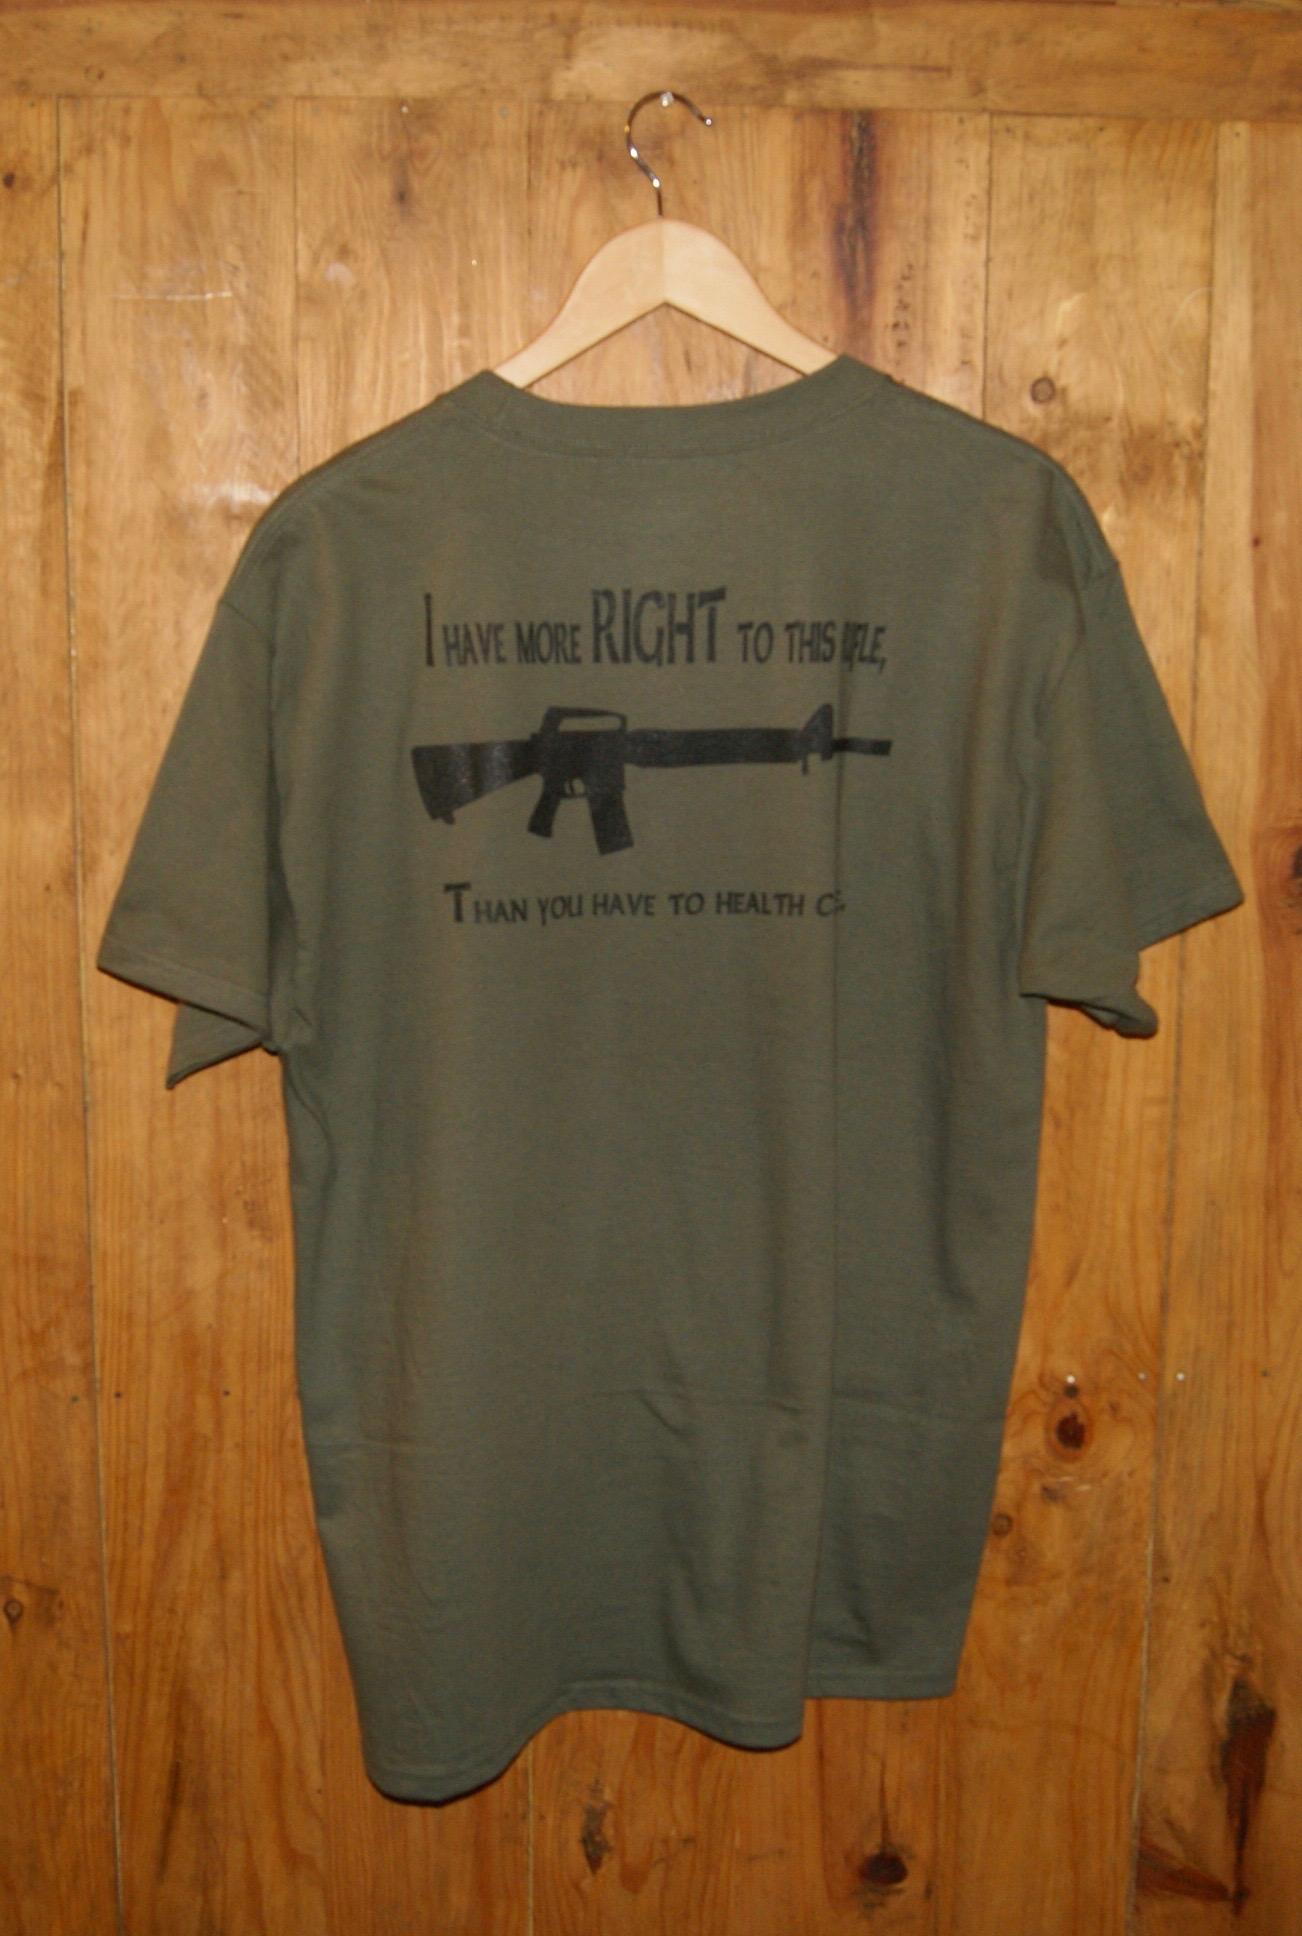 CUSTOM GUN SHIRTS